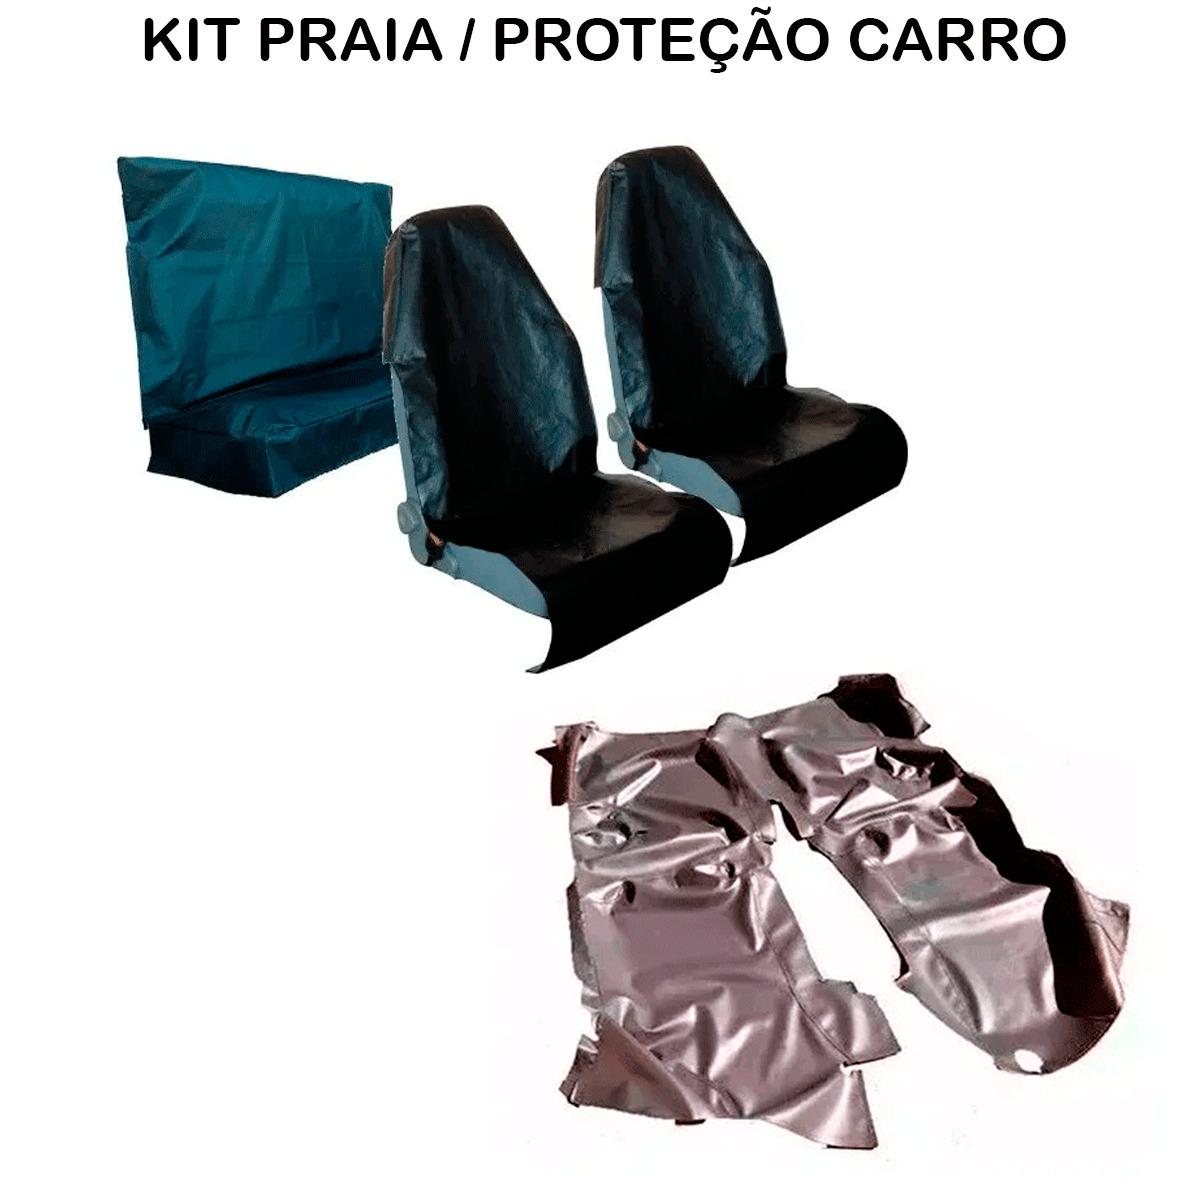 Tapete Em Vinil Volkswagen Parati Track Field + Capa Banco Protecao Banco Areia Suor Academia